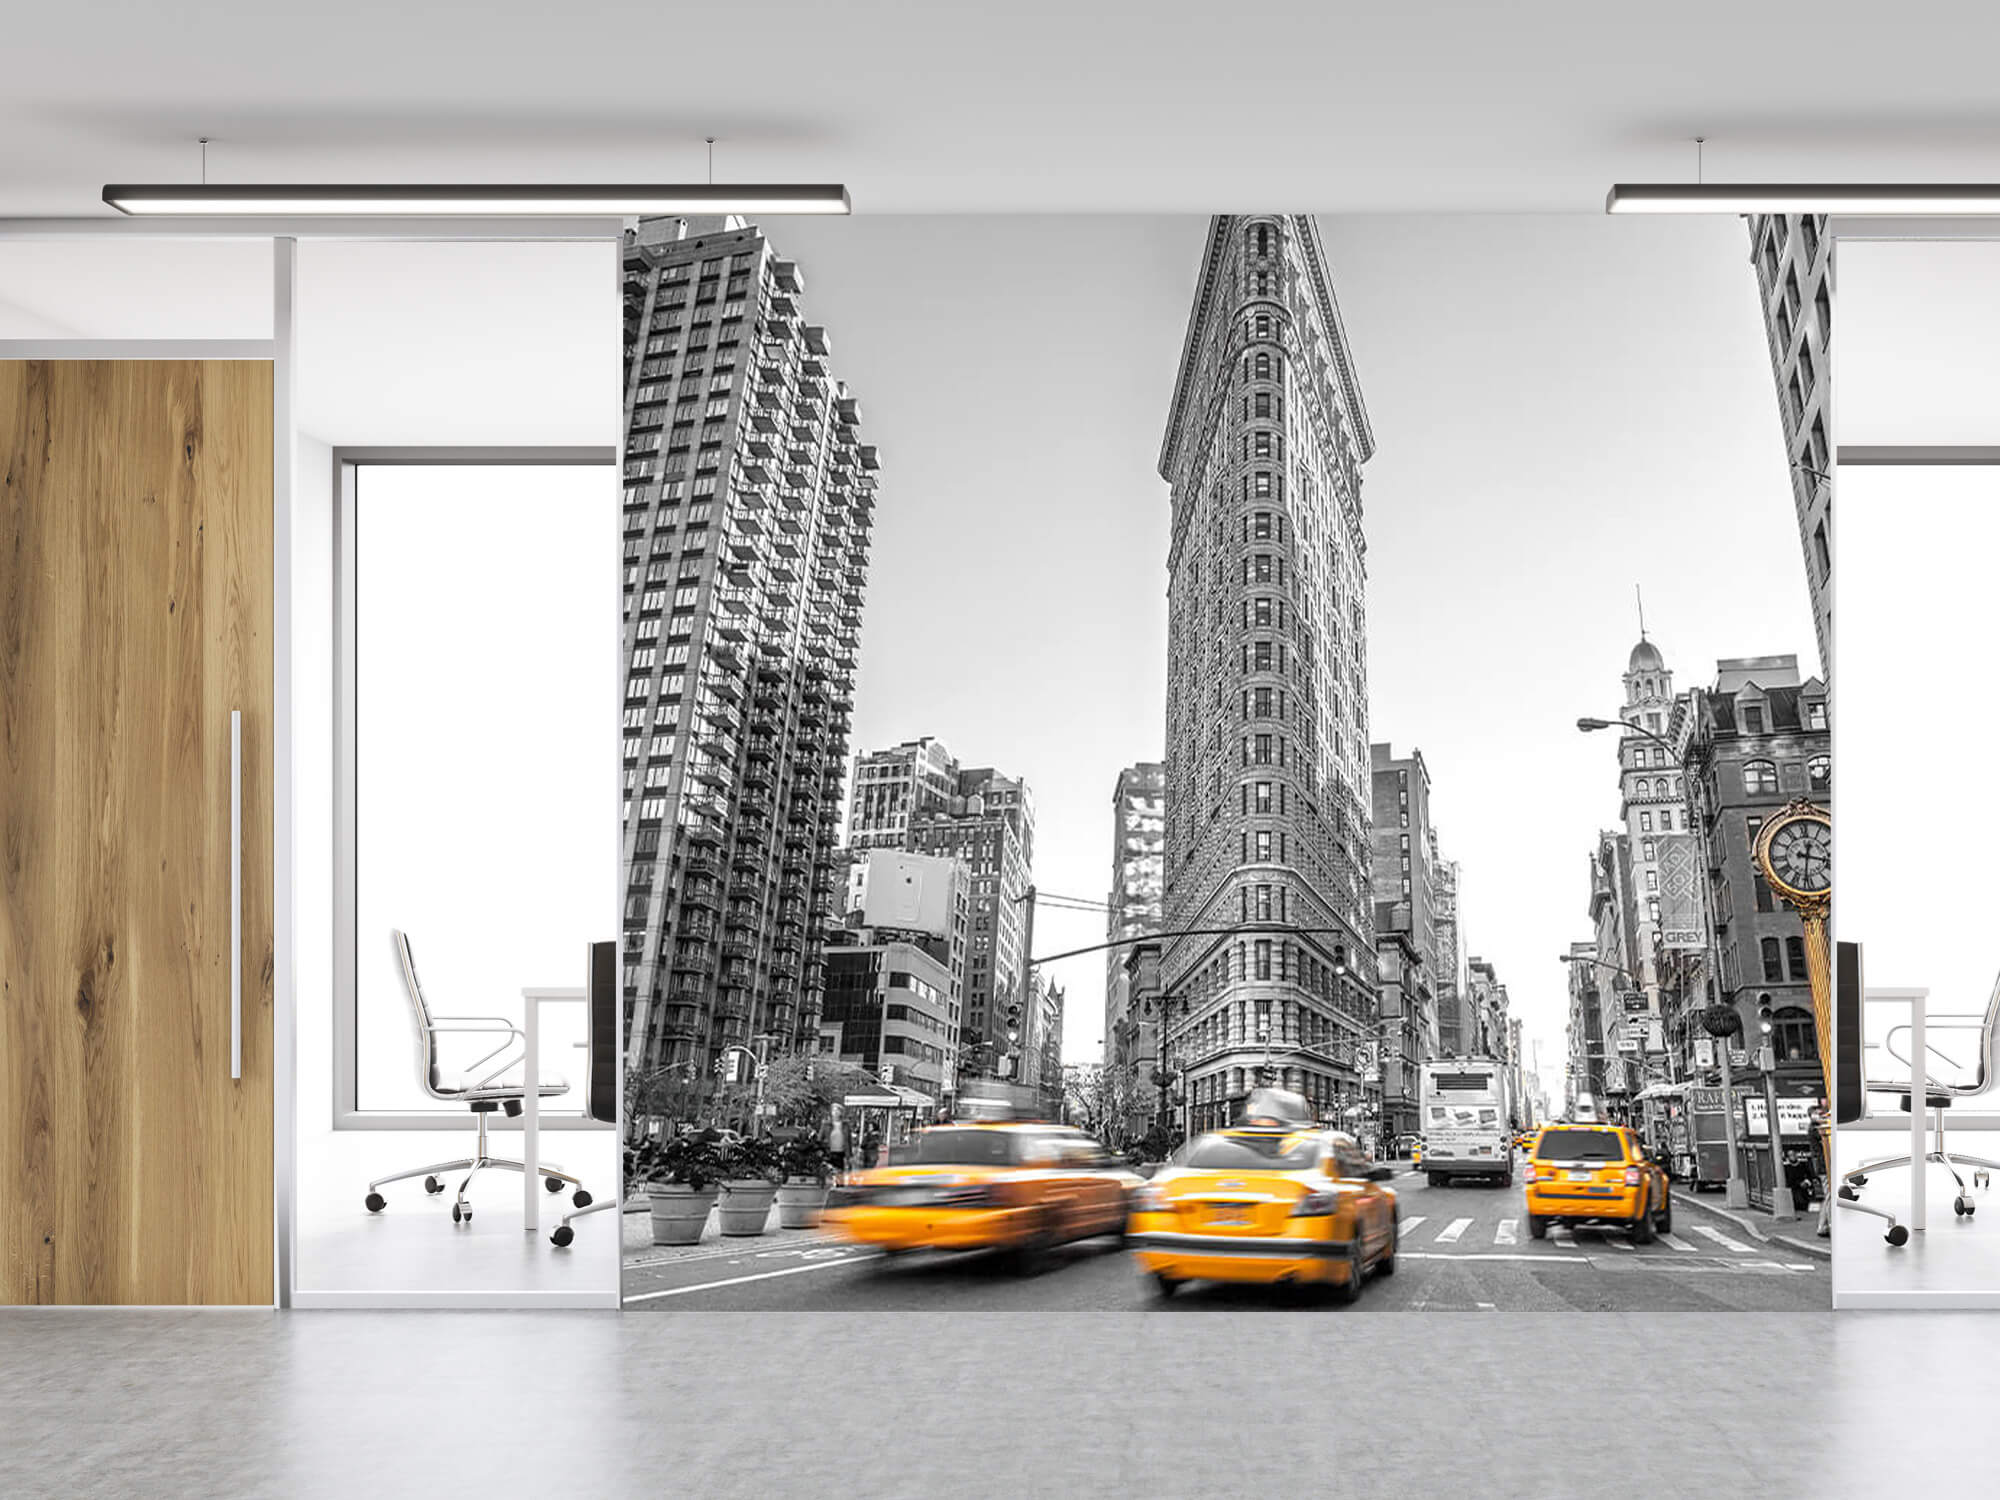 Busy street in New York 5